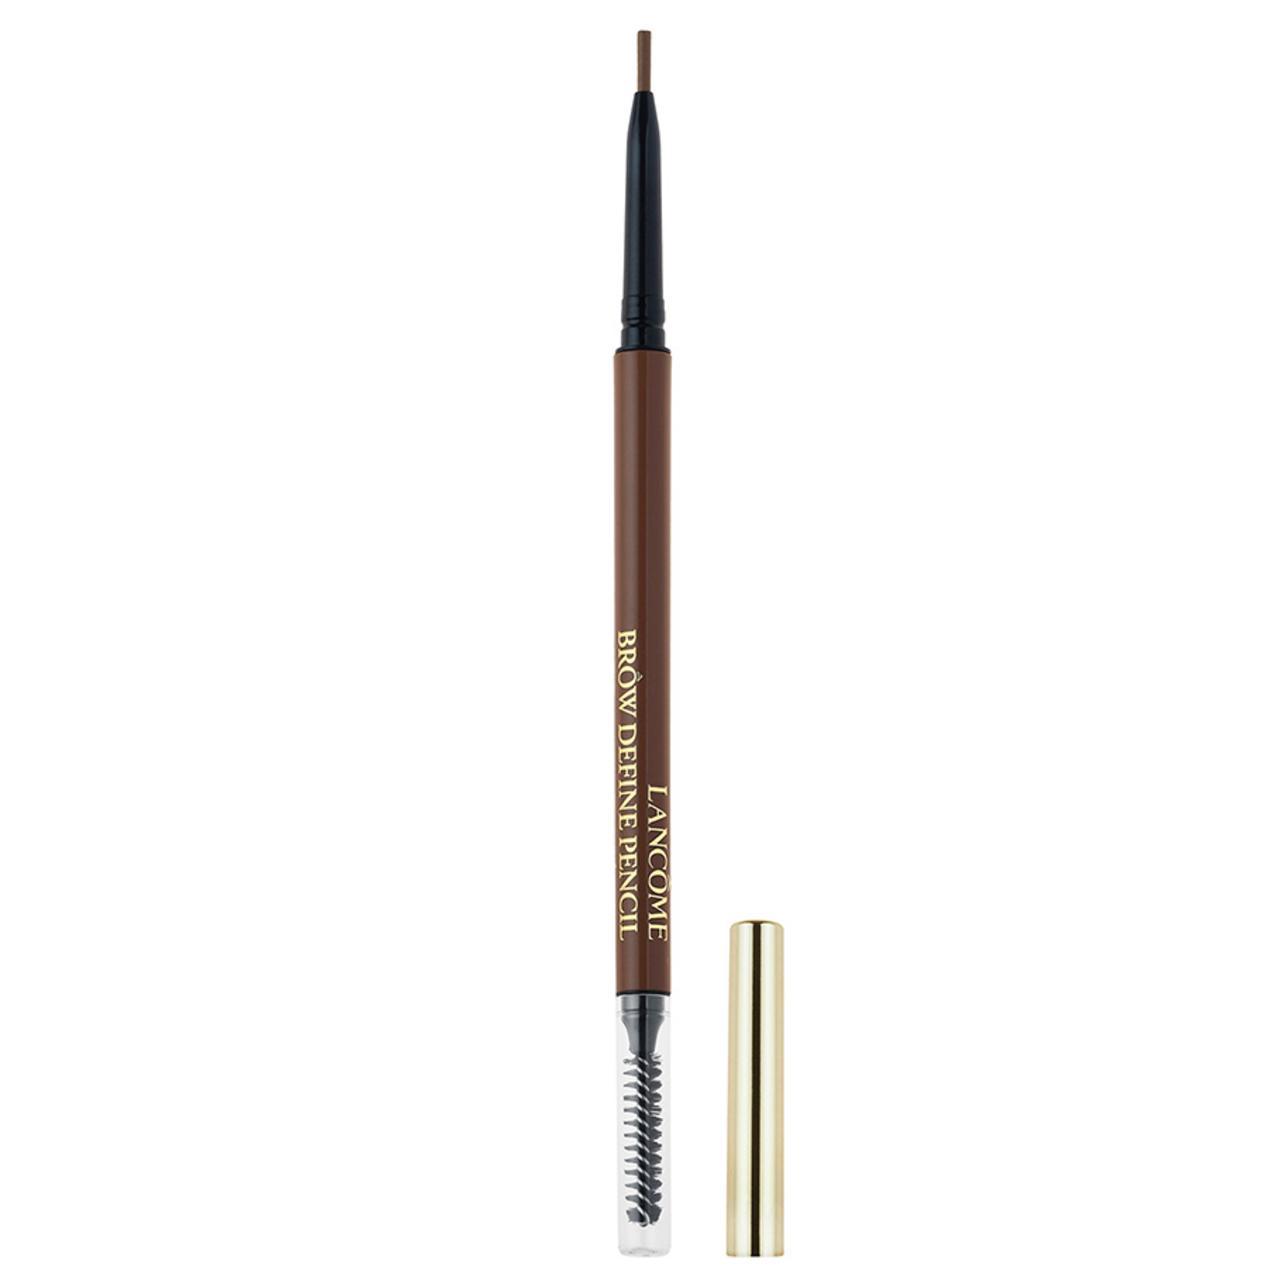 Lancôme Brow Define Pencil, 3.921 kr.